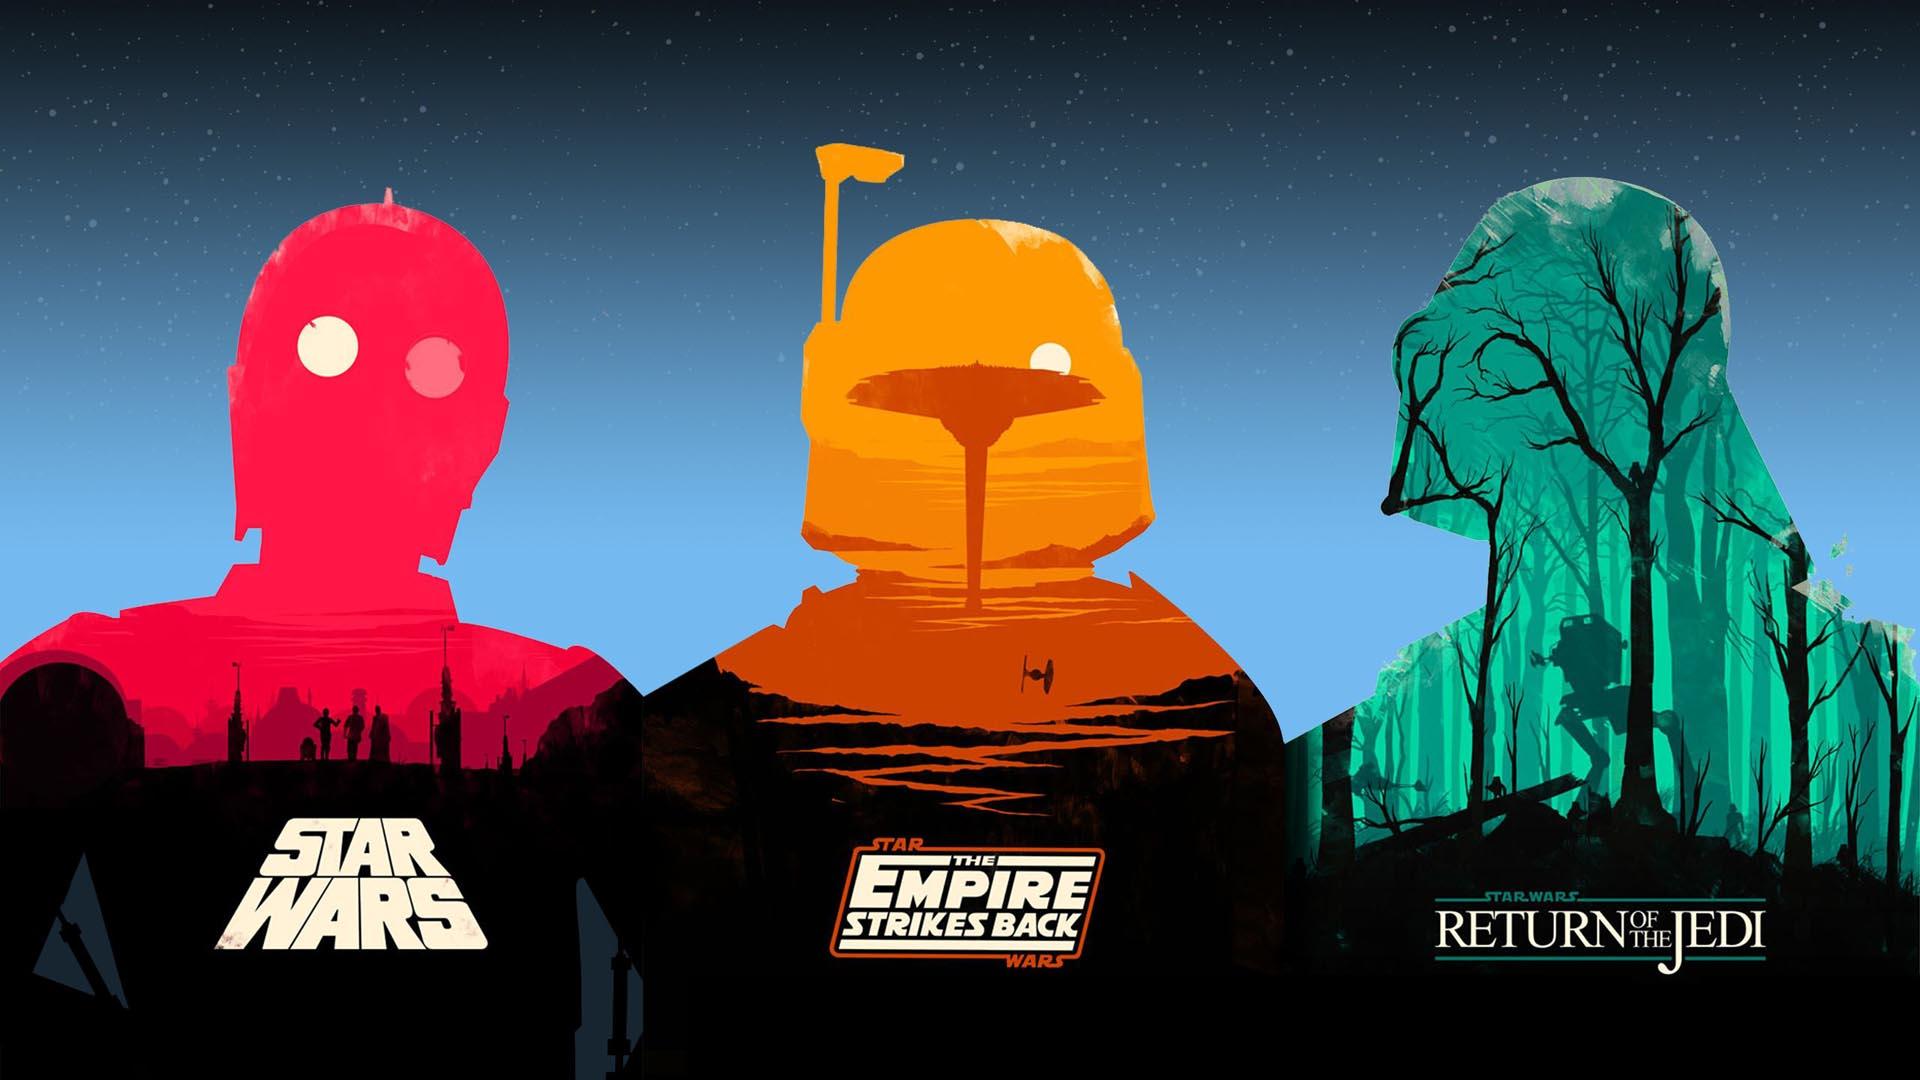 Star-Wars-Wallpaper-8